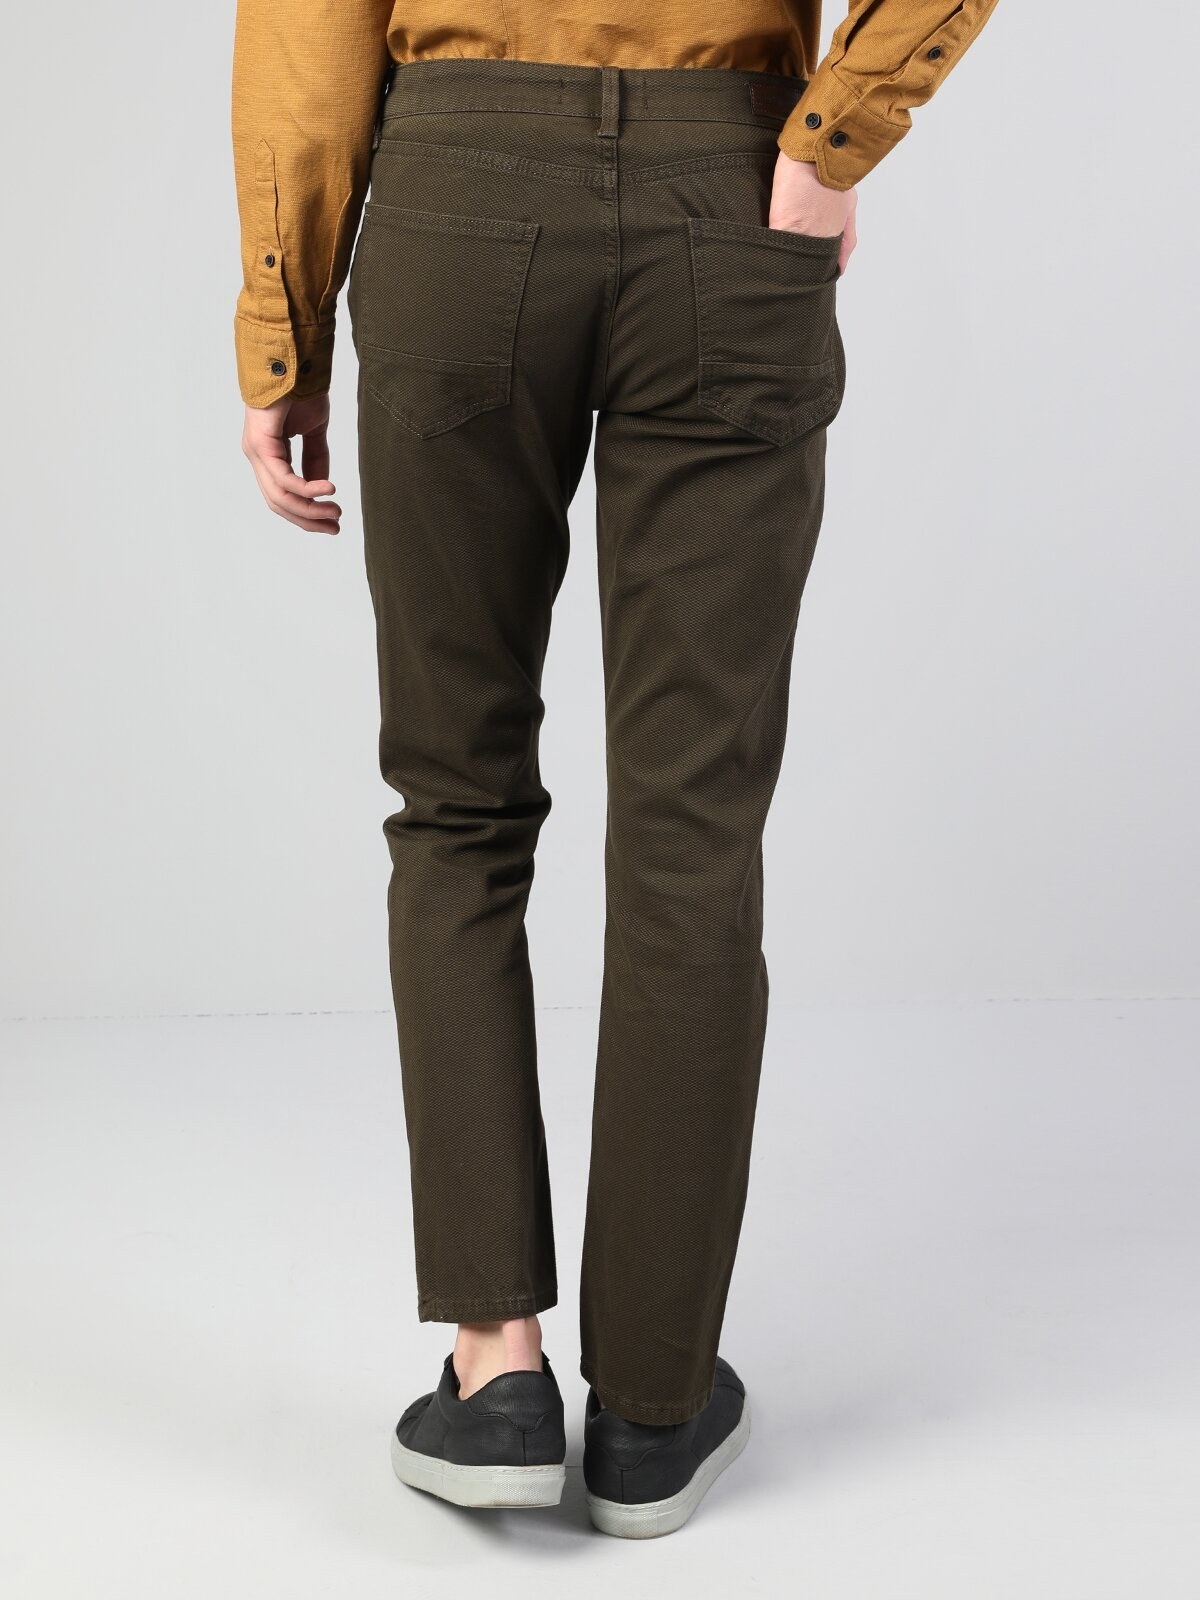 Straight Fit Orta Bel Düz Paça  Erkek Haki Pantolon